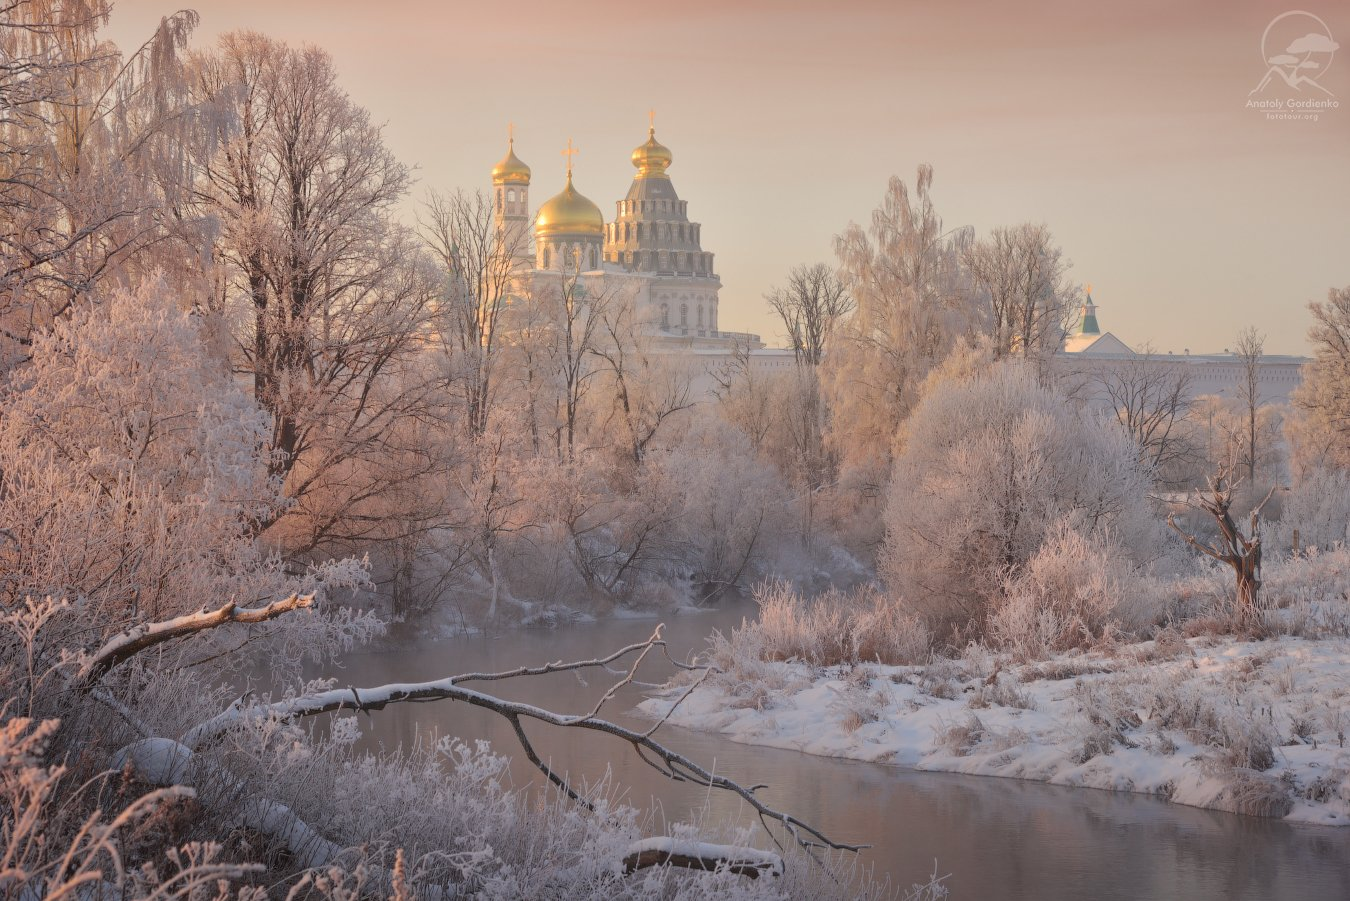 пейзаж, природа, истра, река, утро, монастырь, зима, мороз, Анатолий Гордиенко www.fototour.org